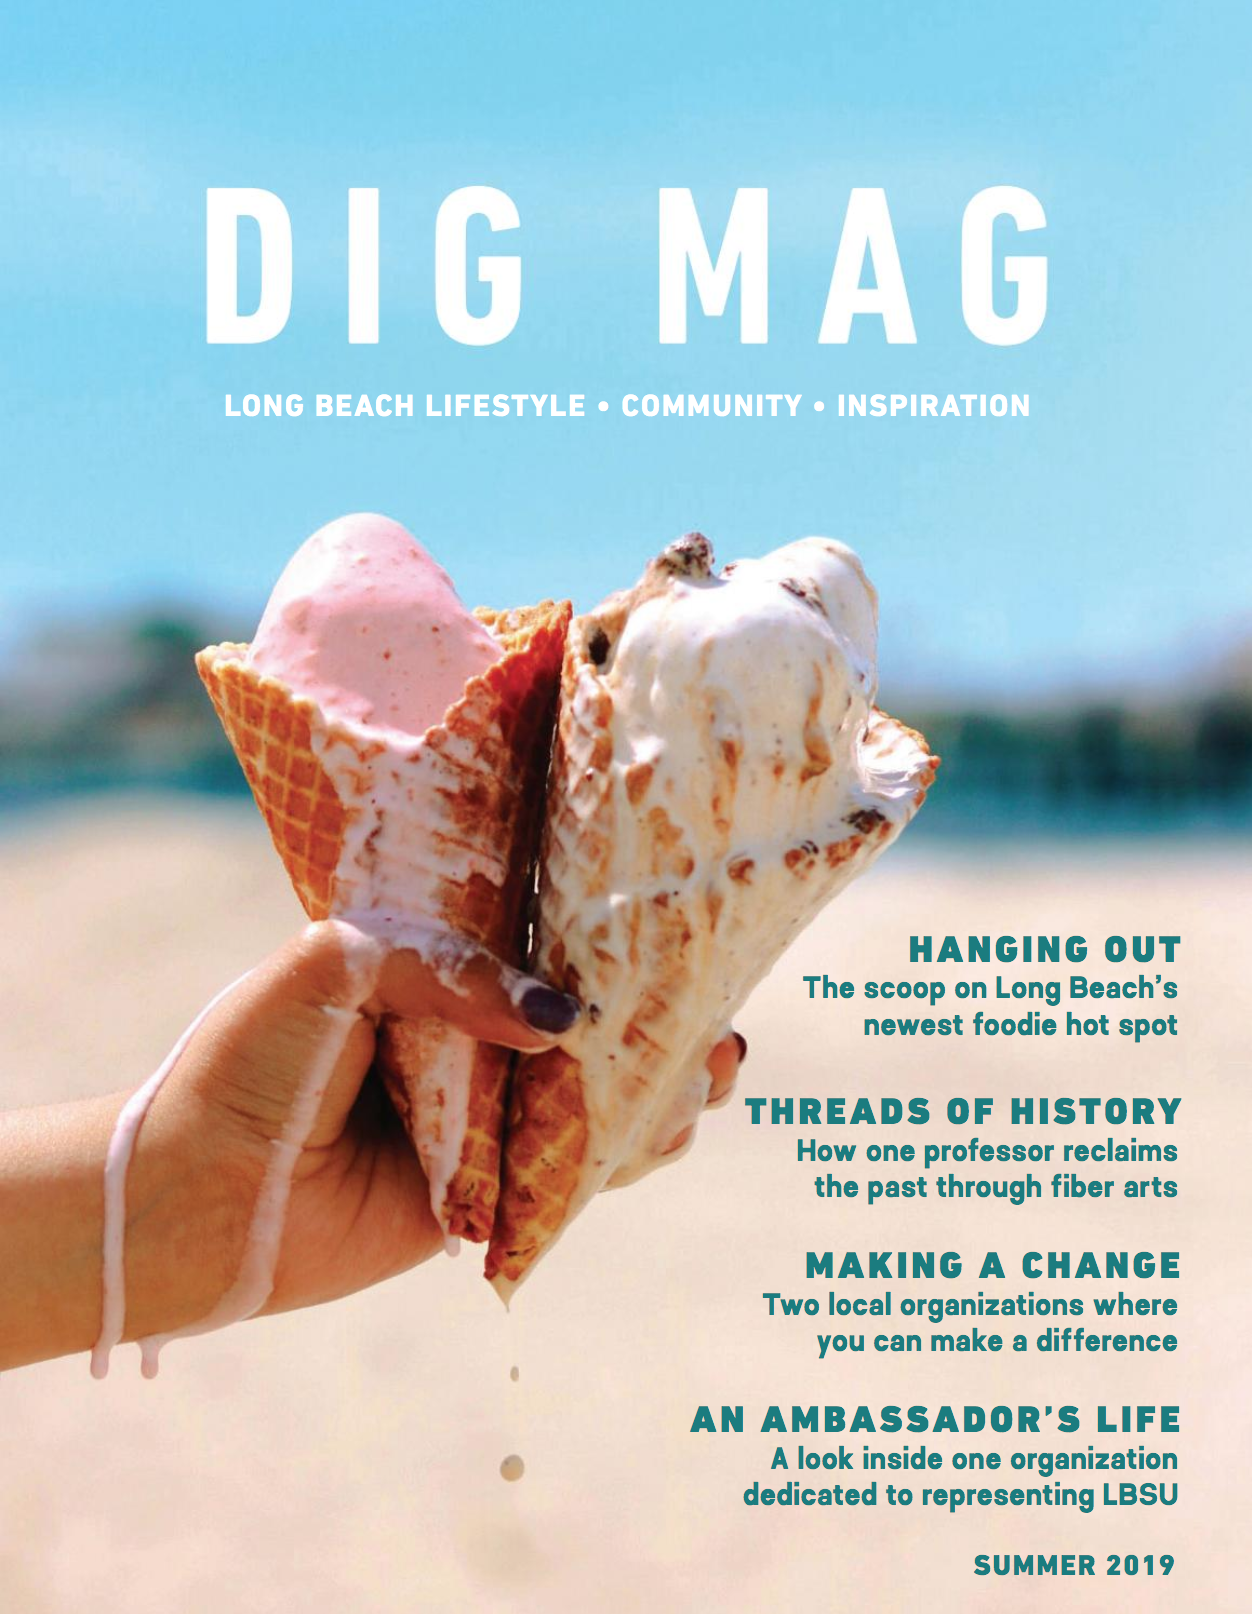 DIG MAG - SUMMER 2019 ISSUE